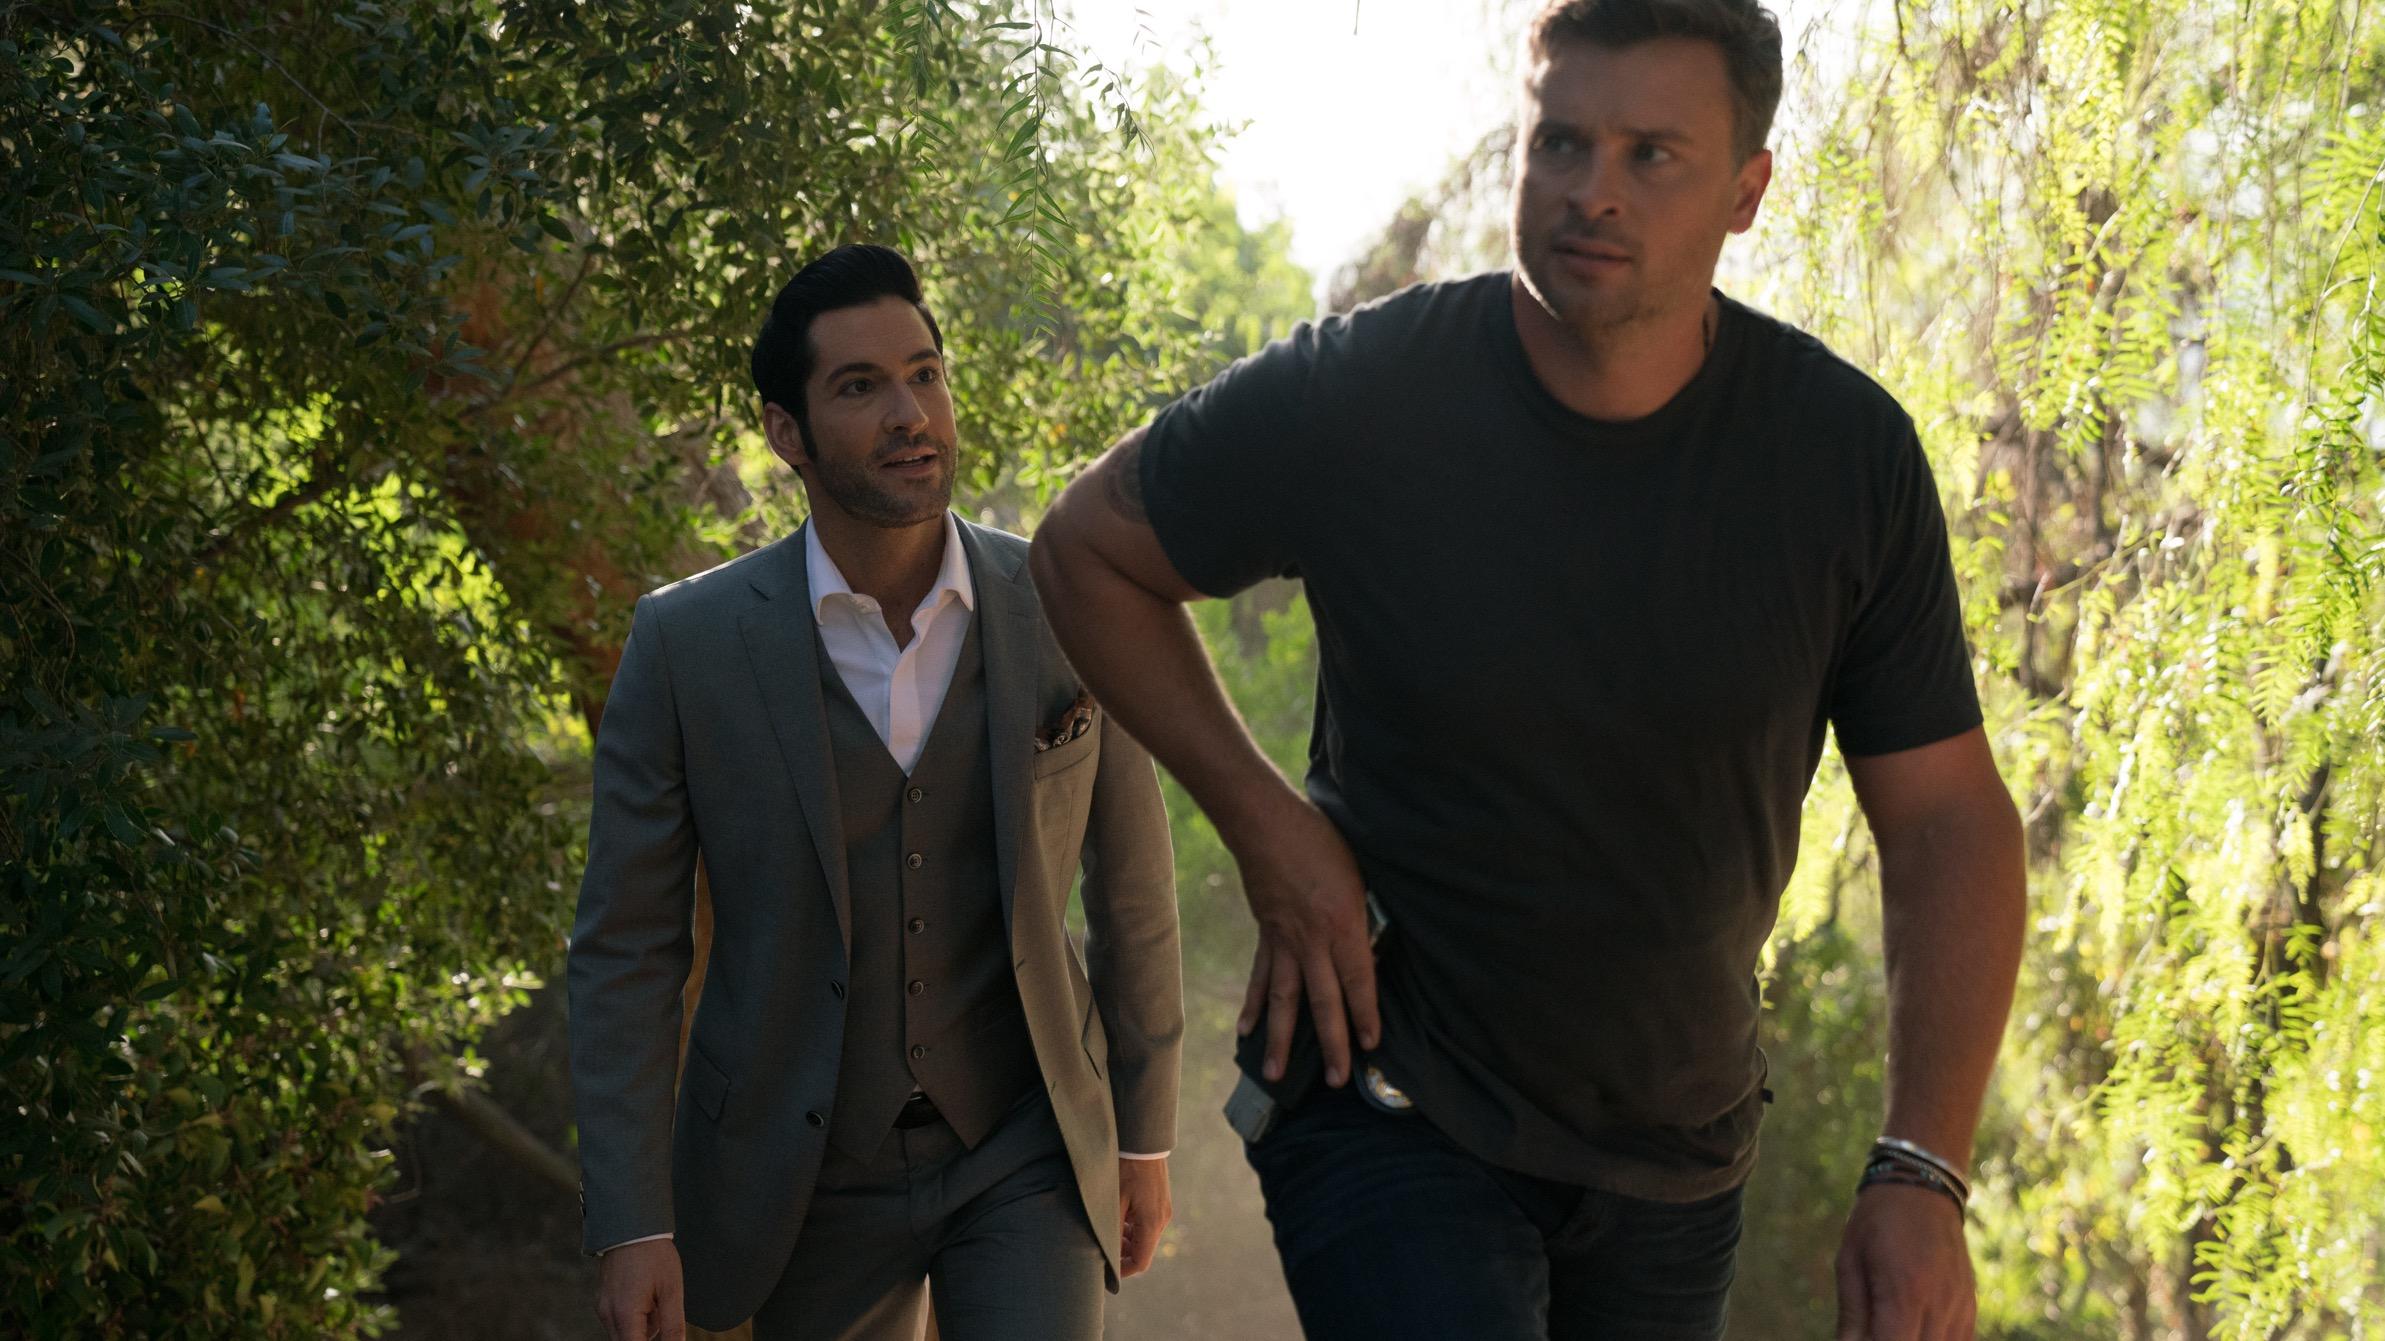 Lucifer Season 3 Episode Guide Joshua eli gomez (born november 20, 1975) is an american actor best known for his role as morgan grimes on chuck. lucifer season 3 episode guide